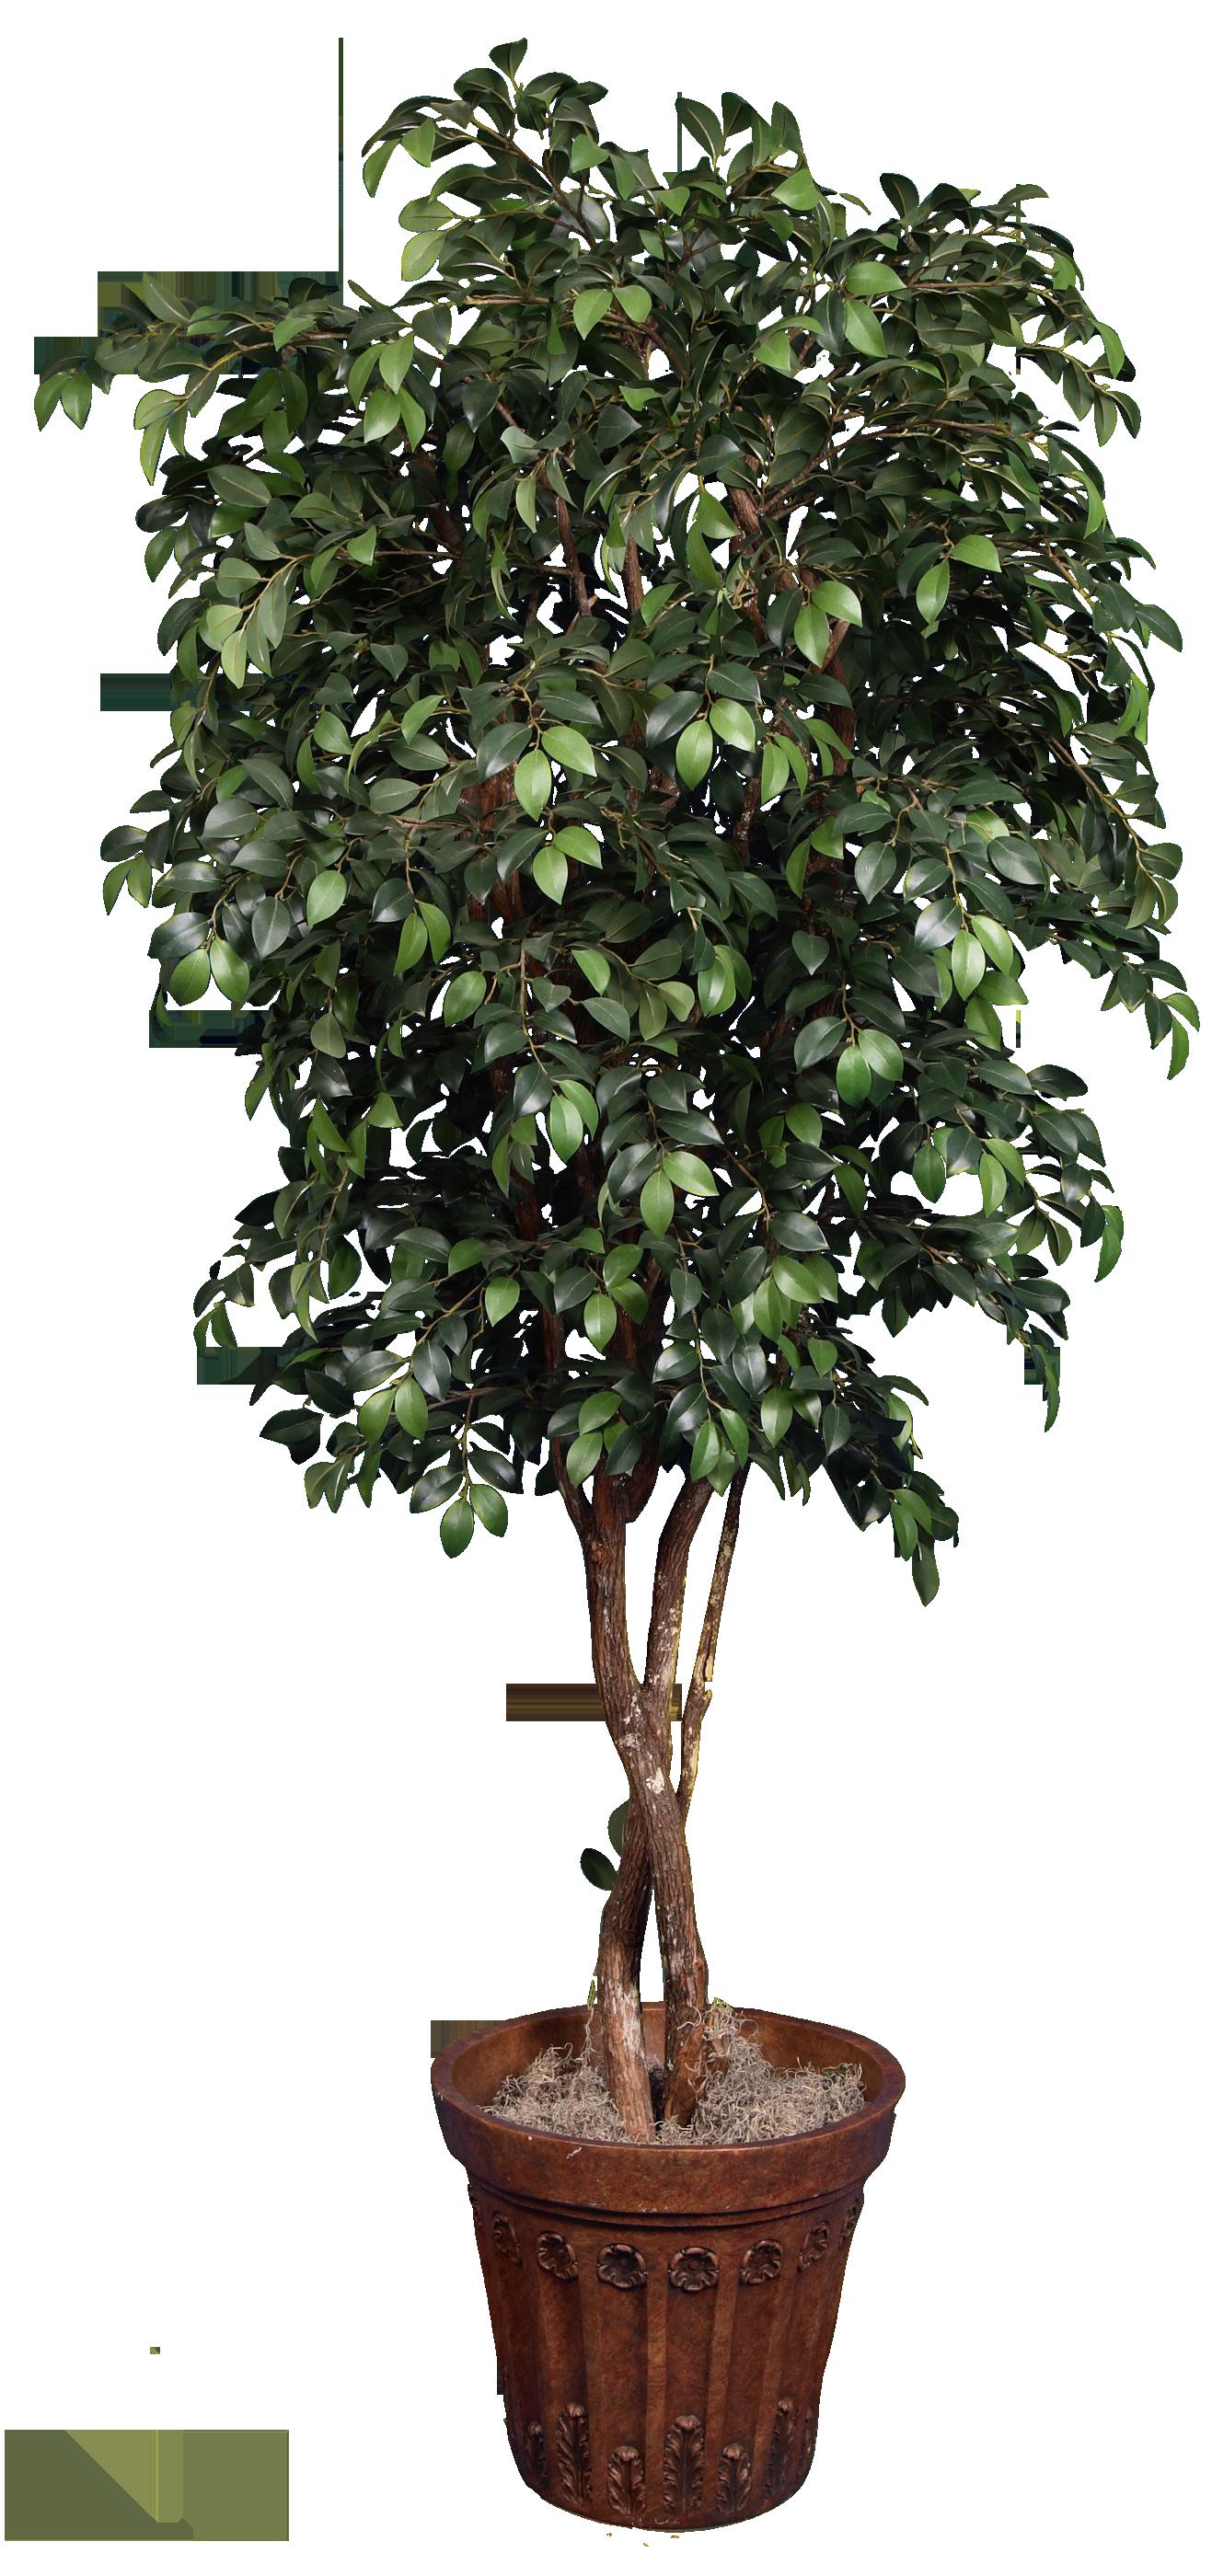 TCM 4608- Sacagi Ficus